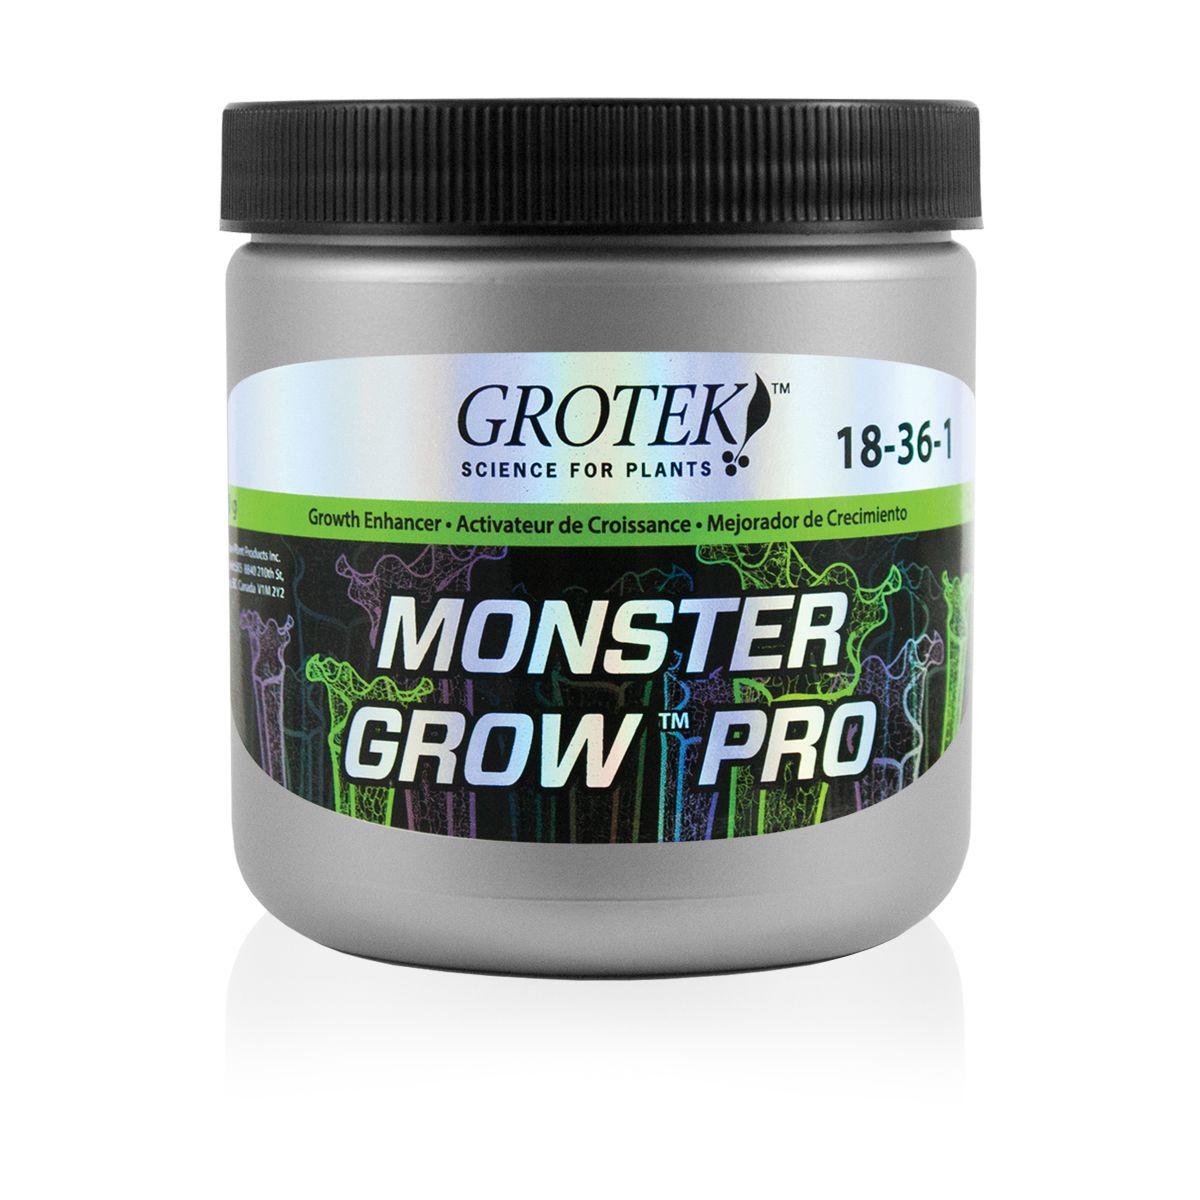 MONSTER GROW PRO™ 130g